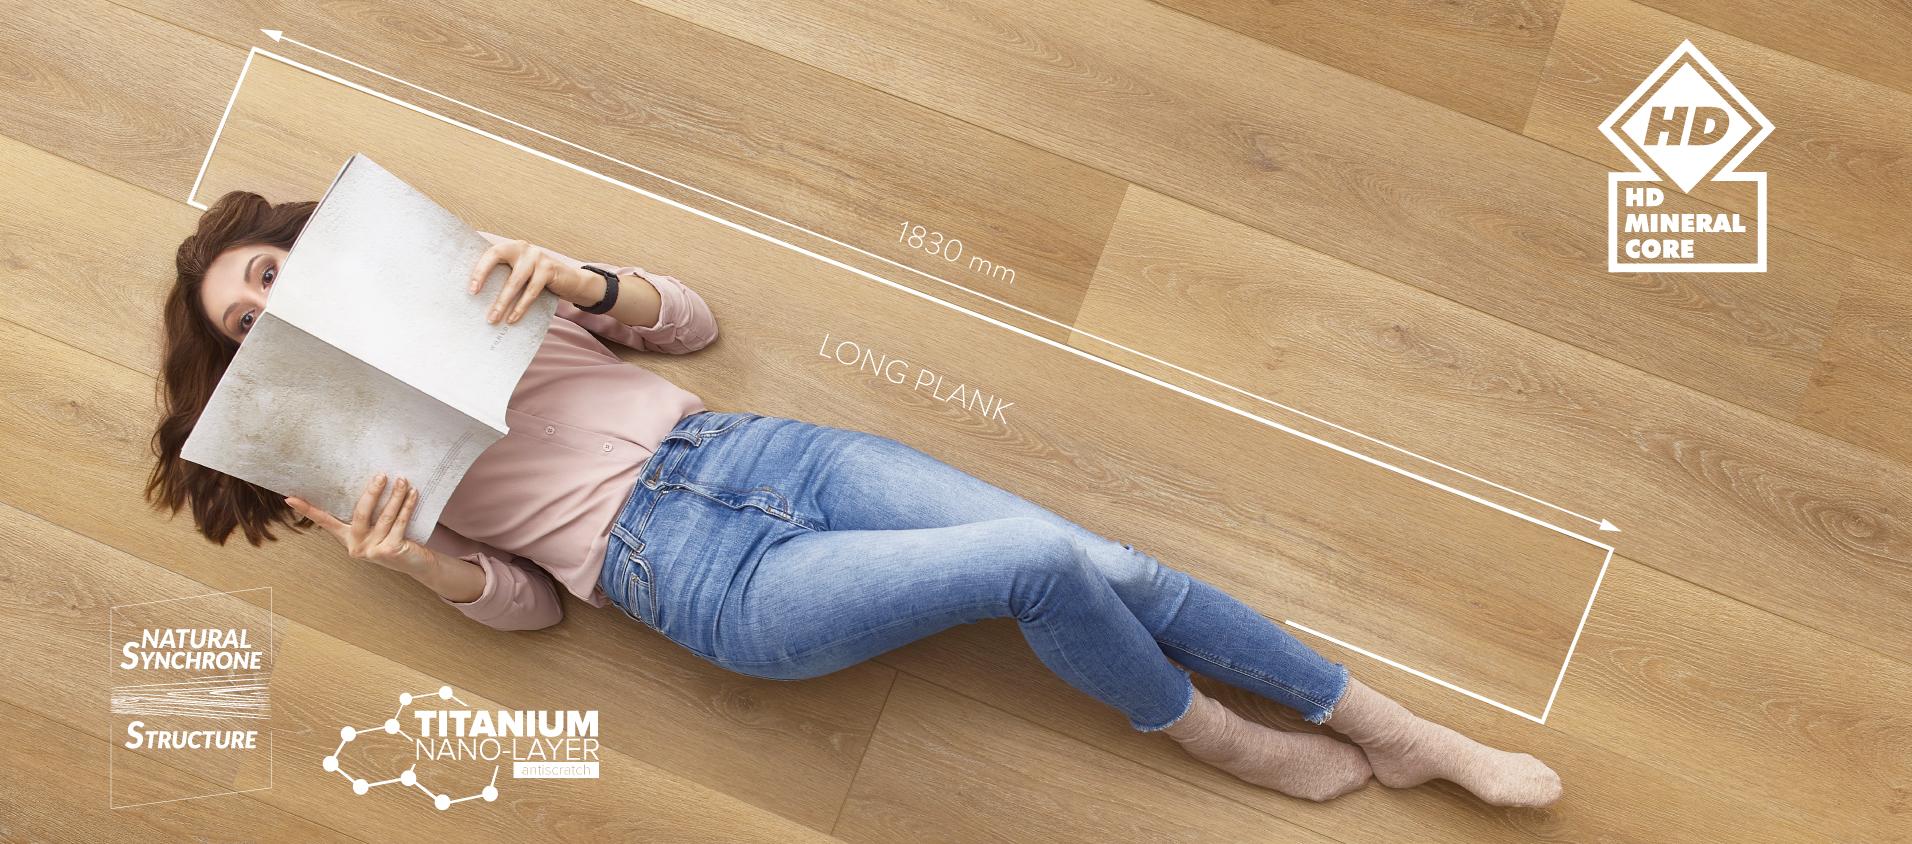 Amaron Superiore long plank